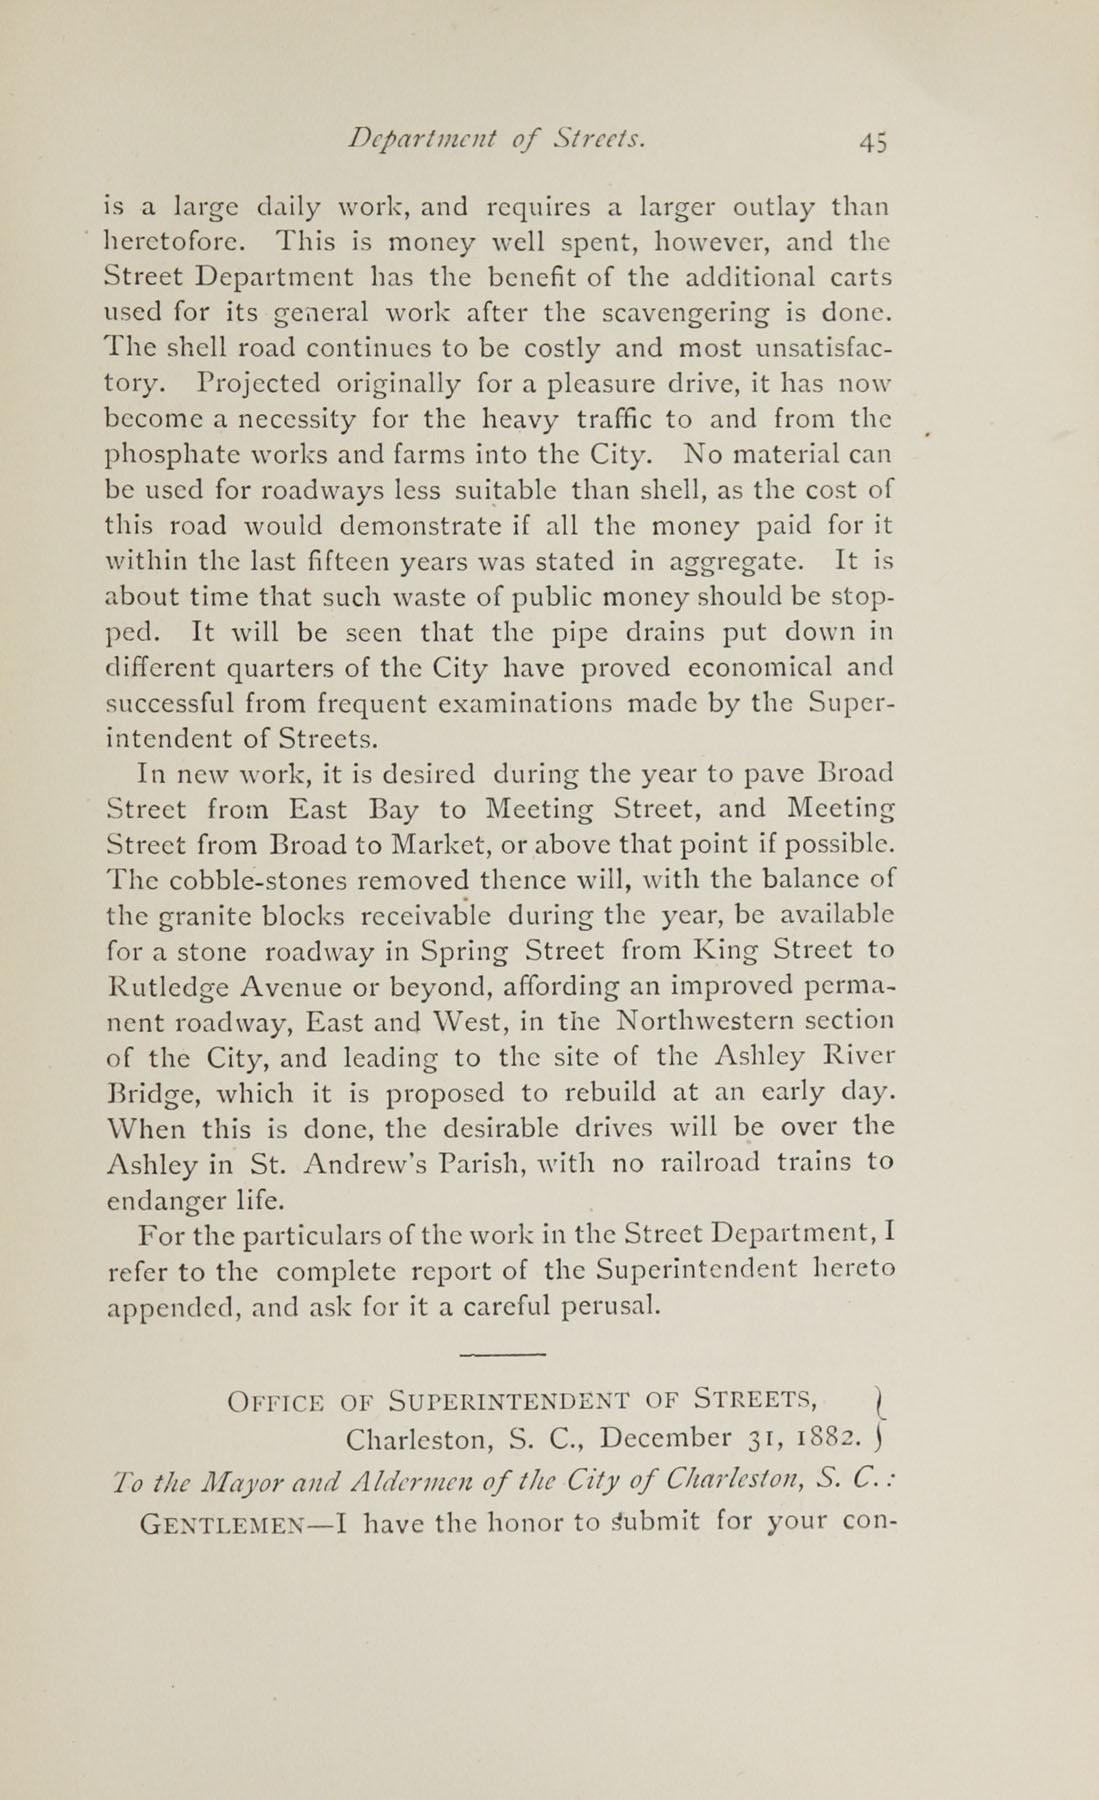 Charleston Yearbook, 1882, page 45